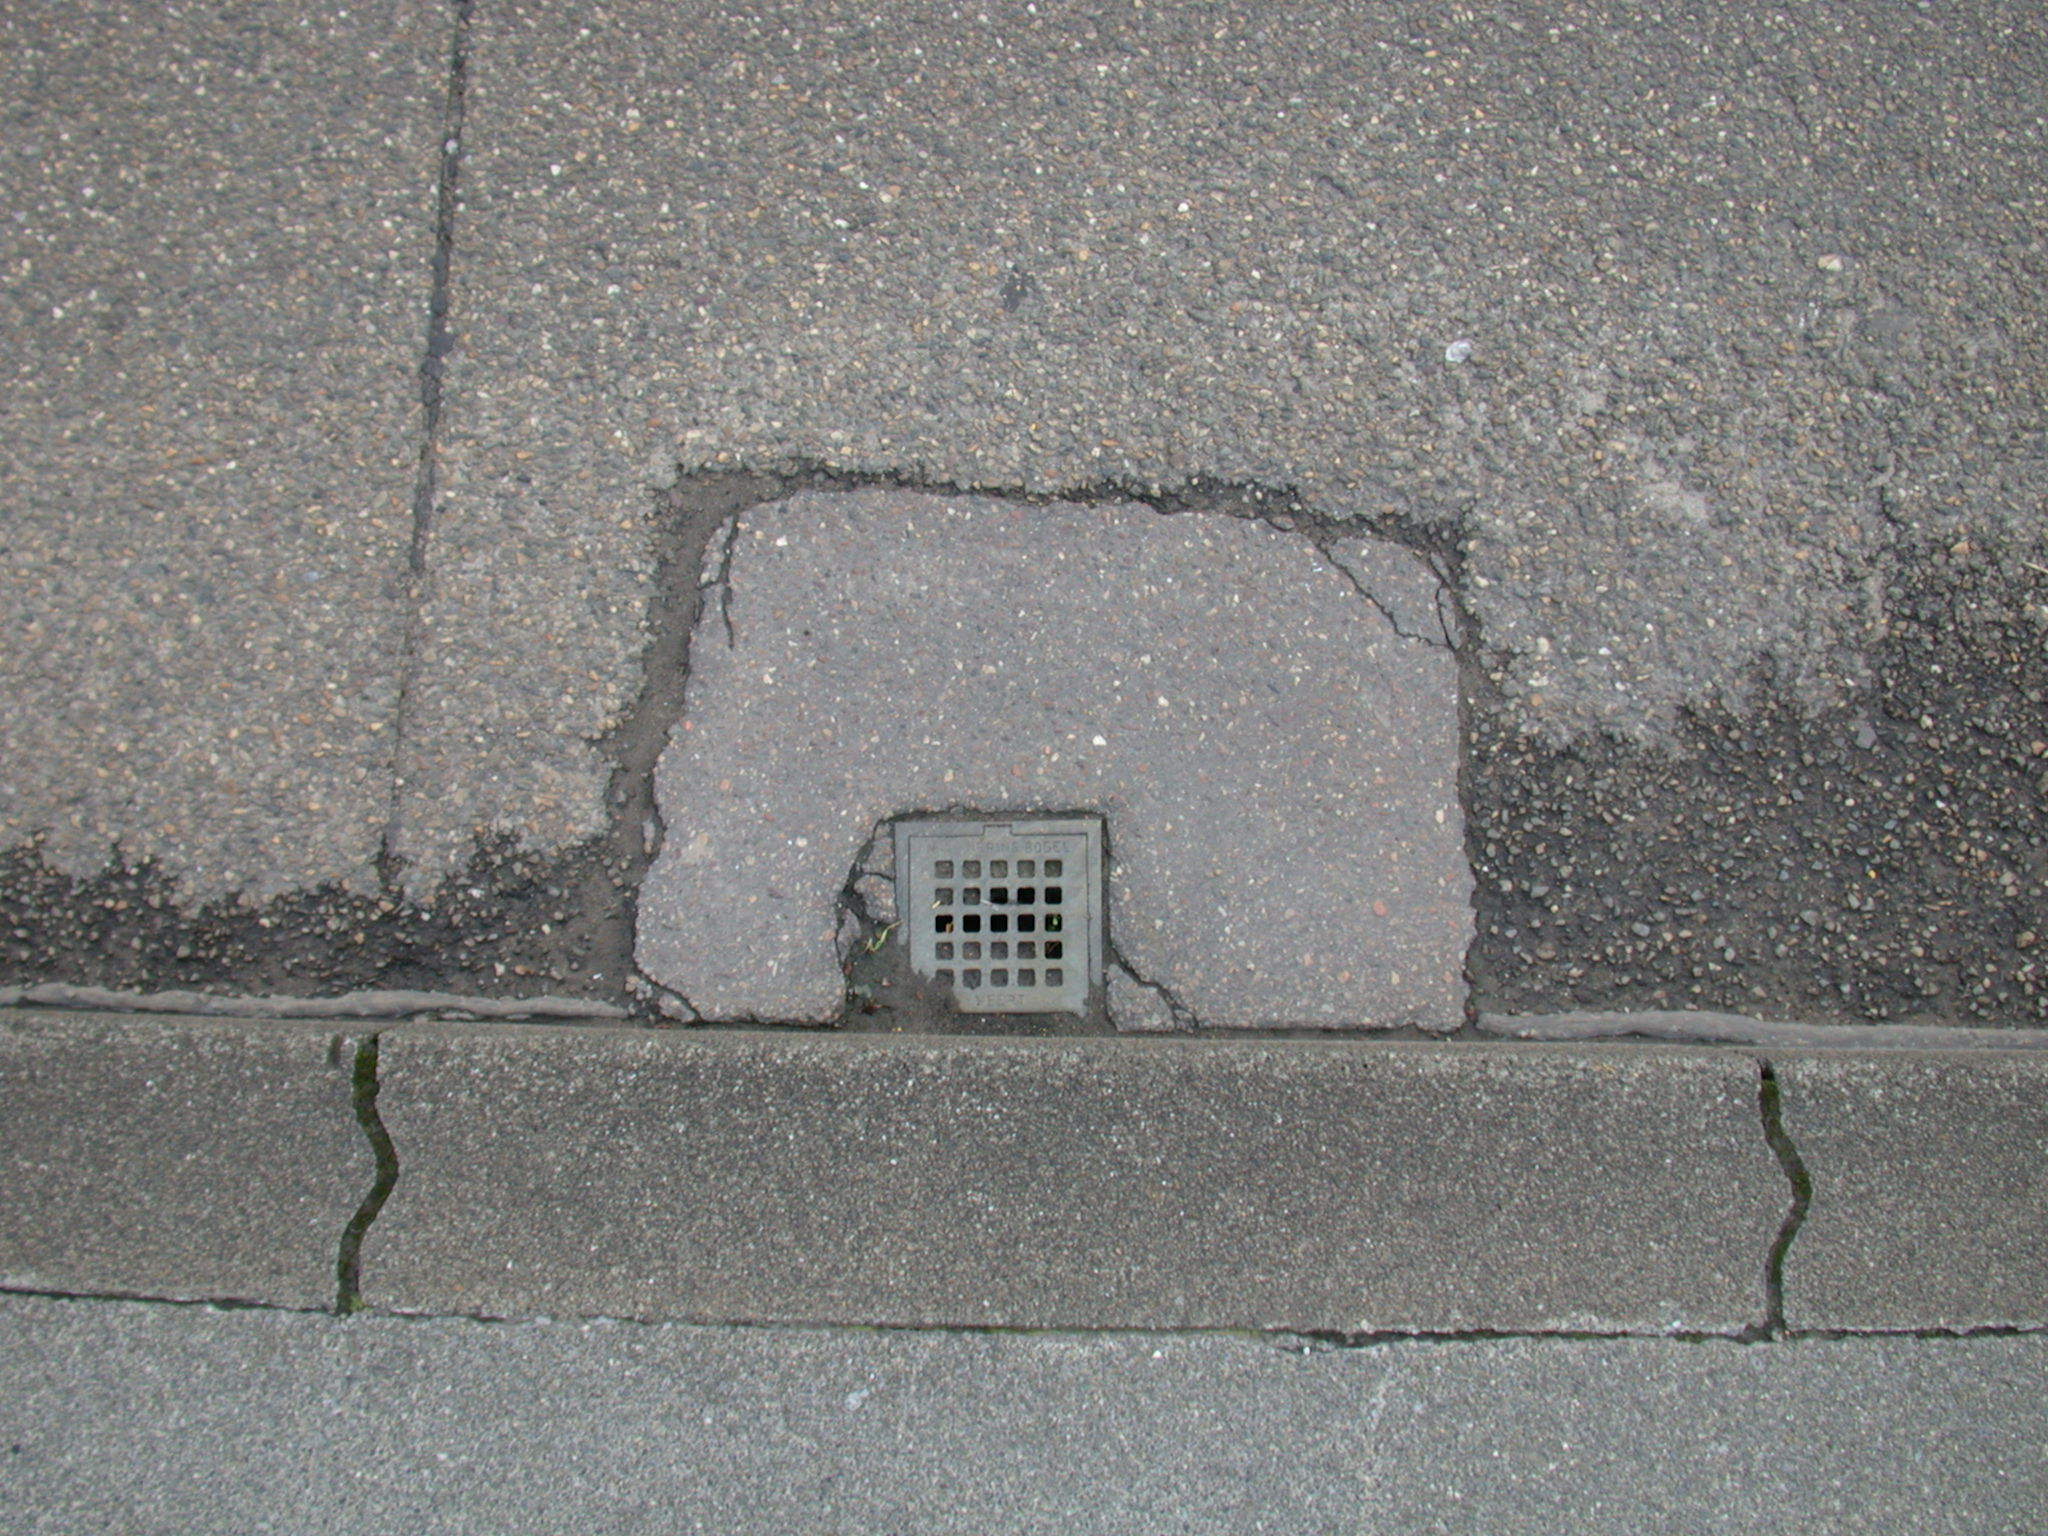 grounds street asphalt drain sidewalk texture